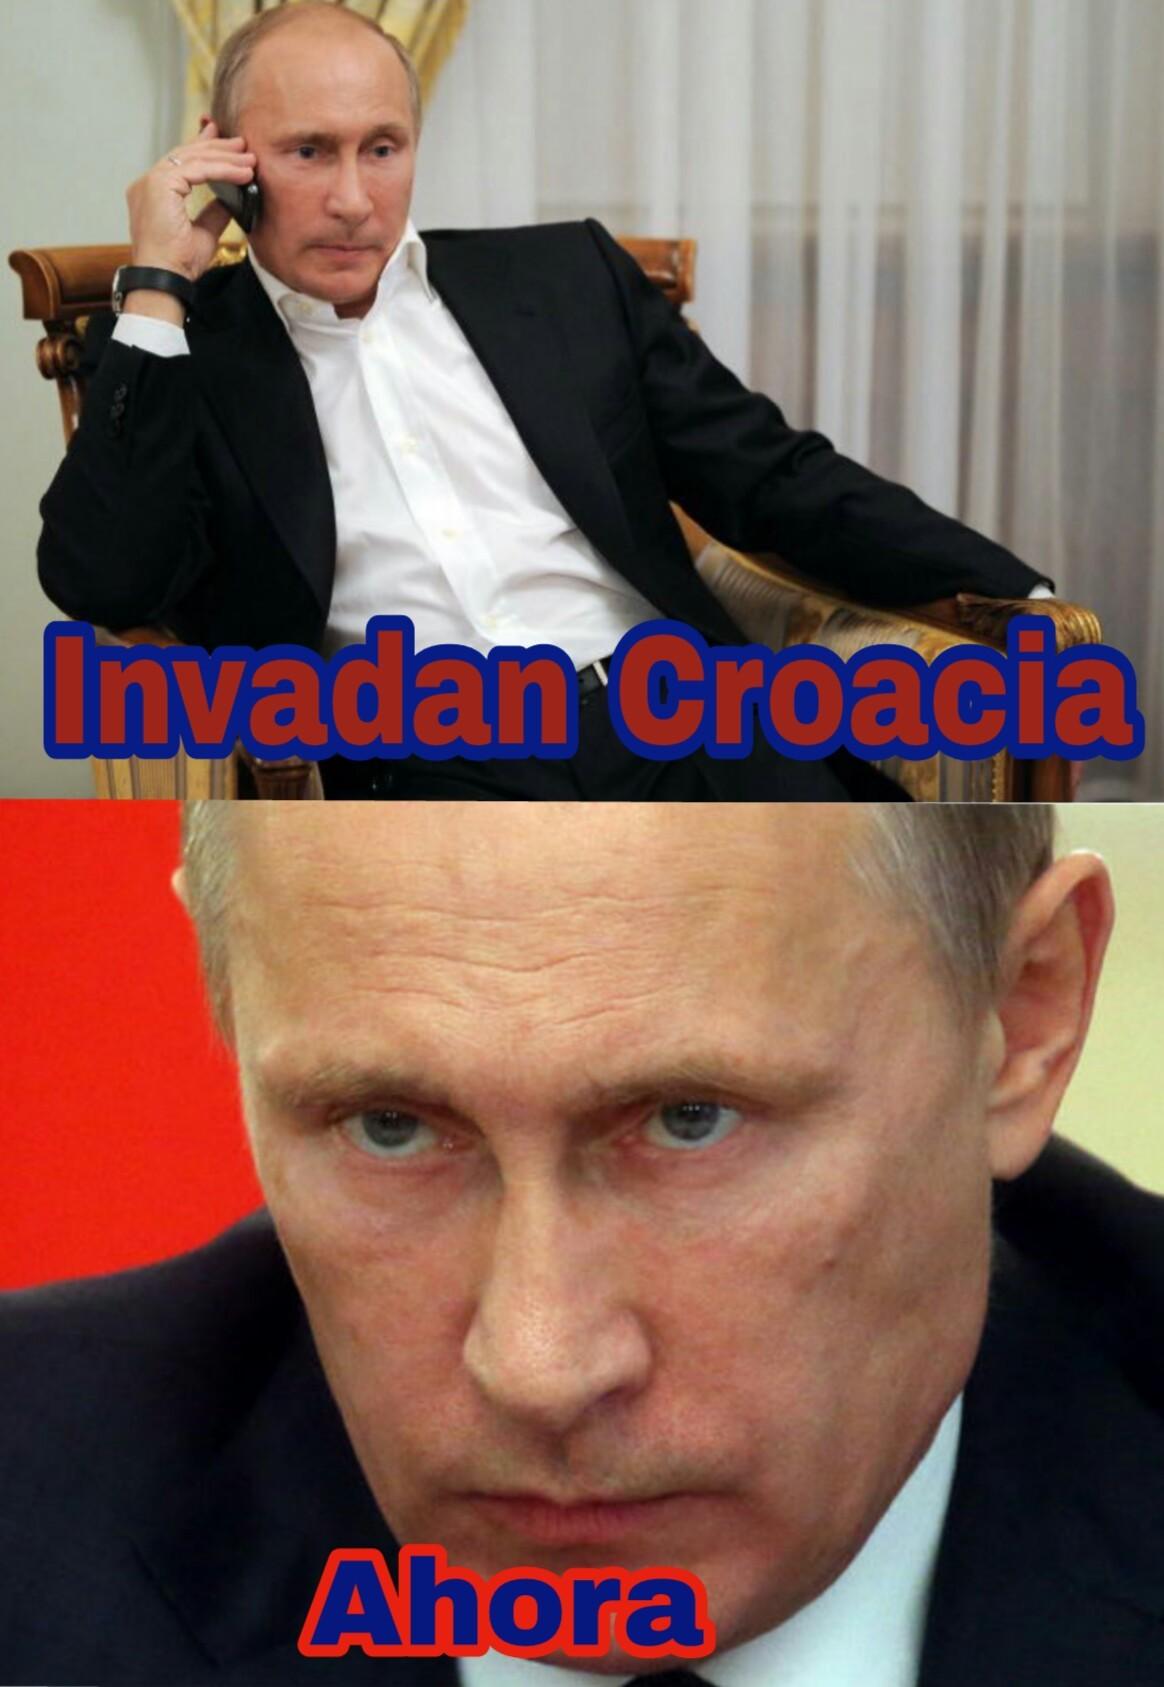 Eliminaron a la madre rusia :sad: - meme